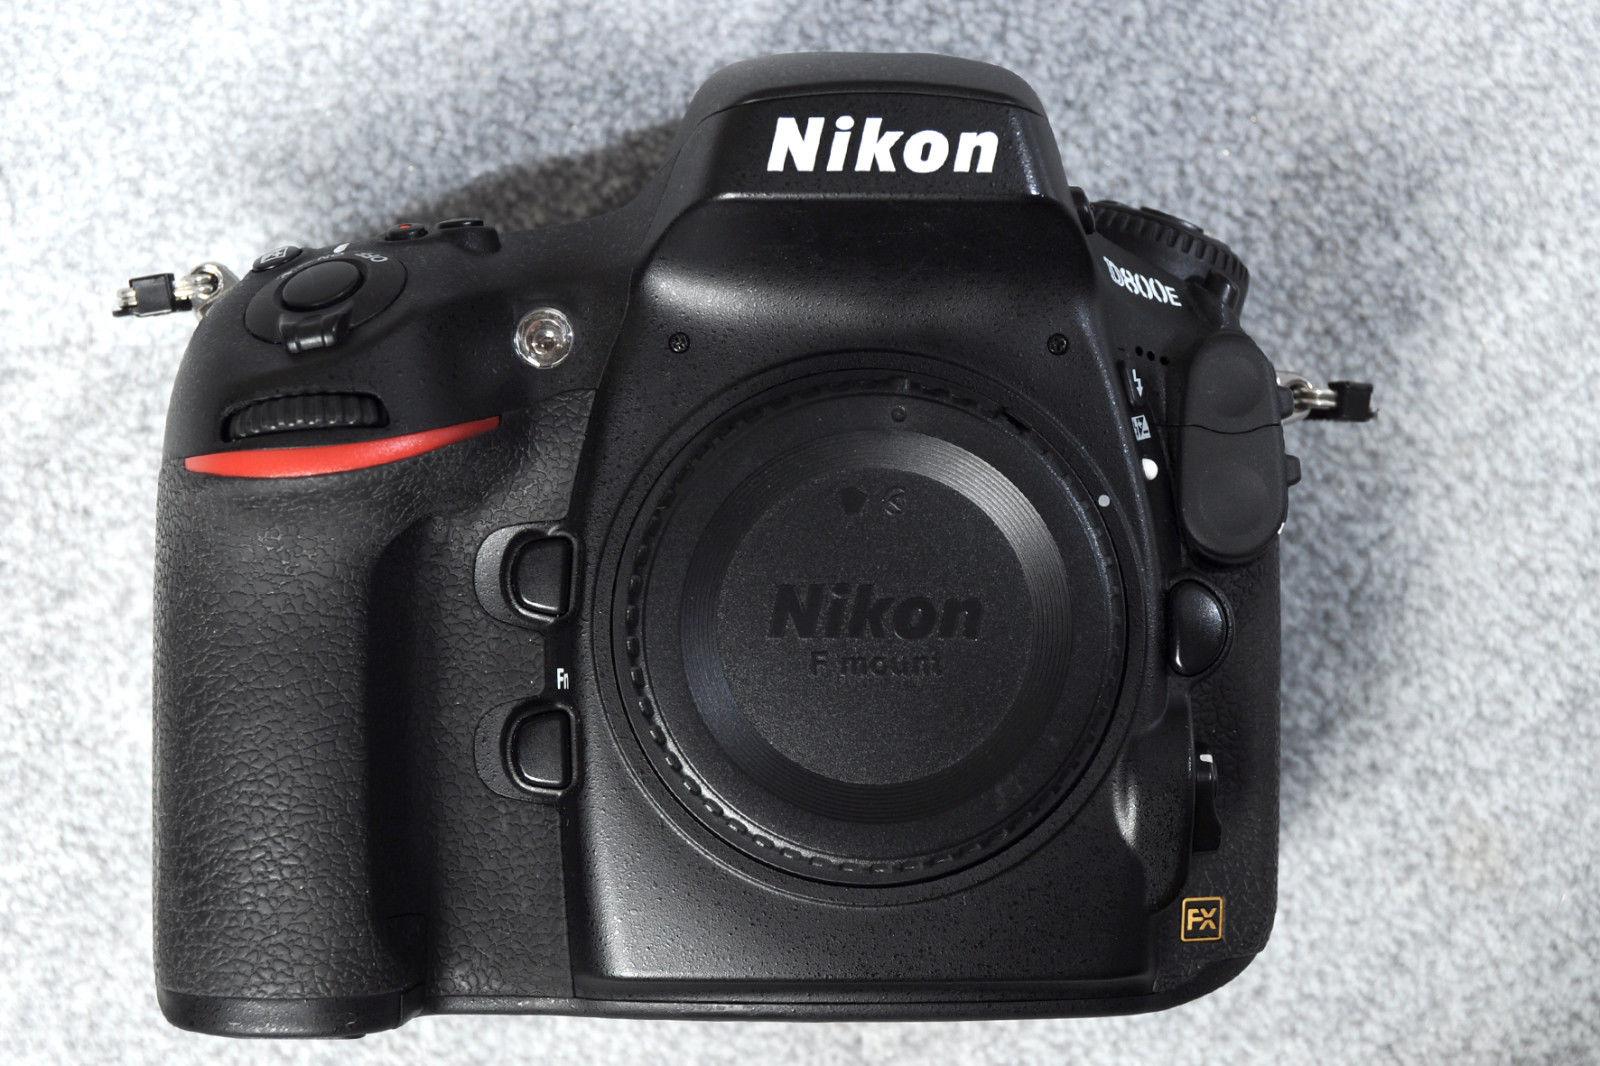 Nikon D D800E 36.3 MP SLR-Digitalkamera - Gehäuse  23700 Auslösungen